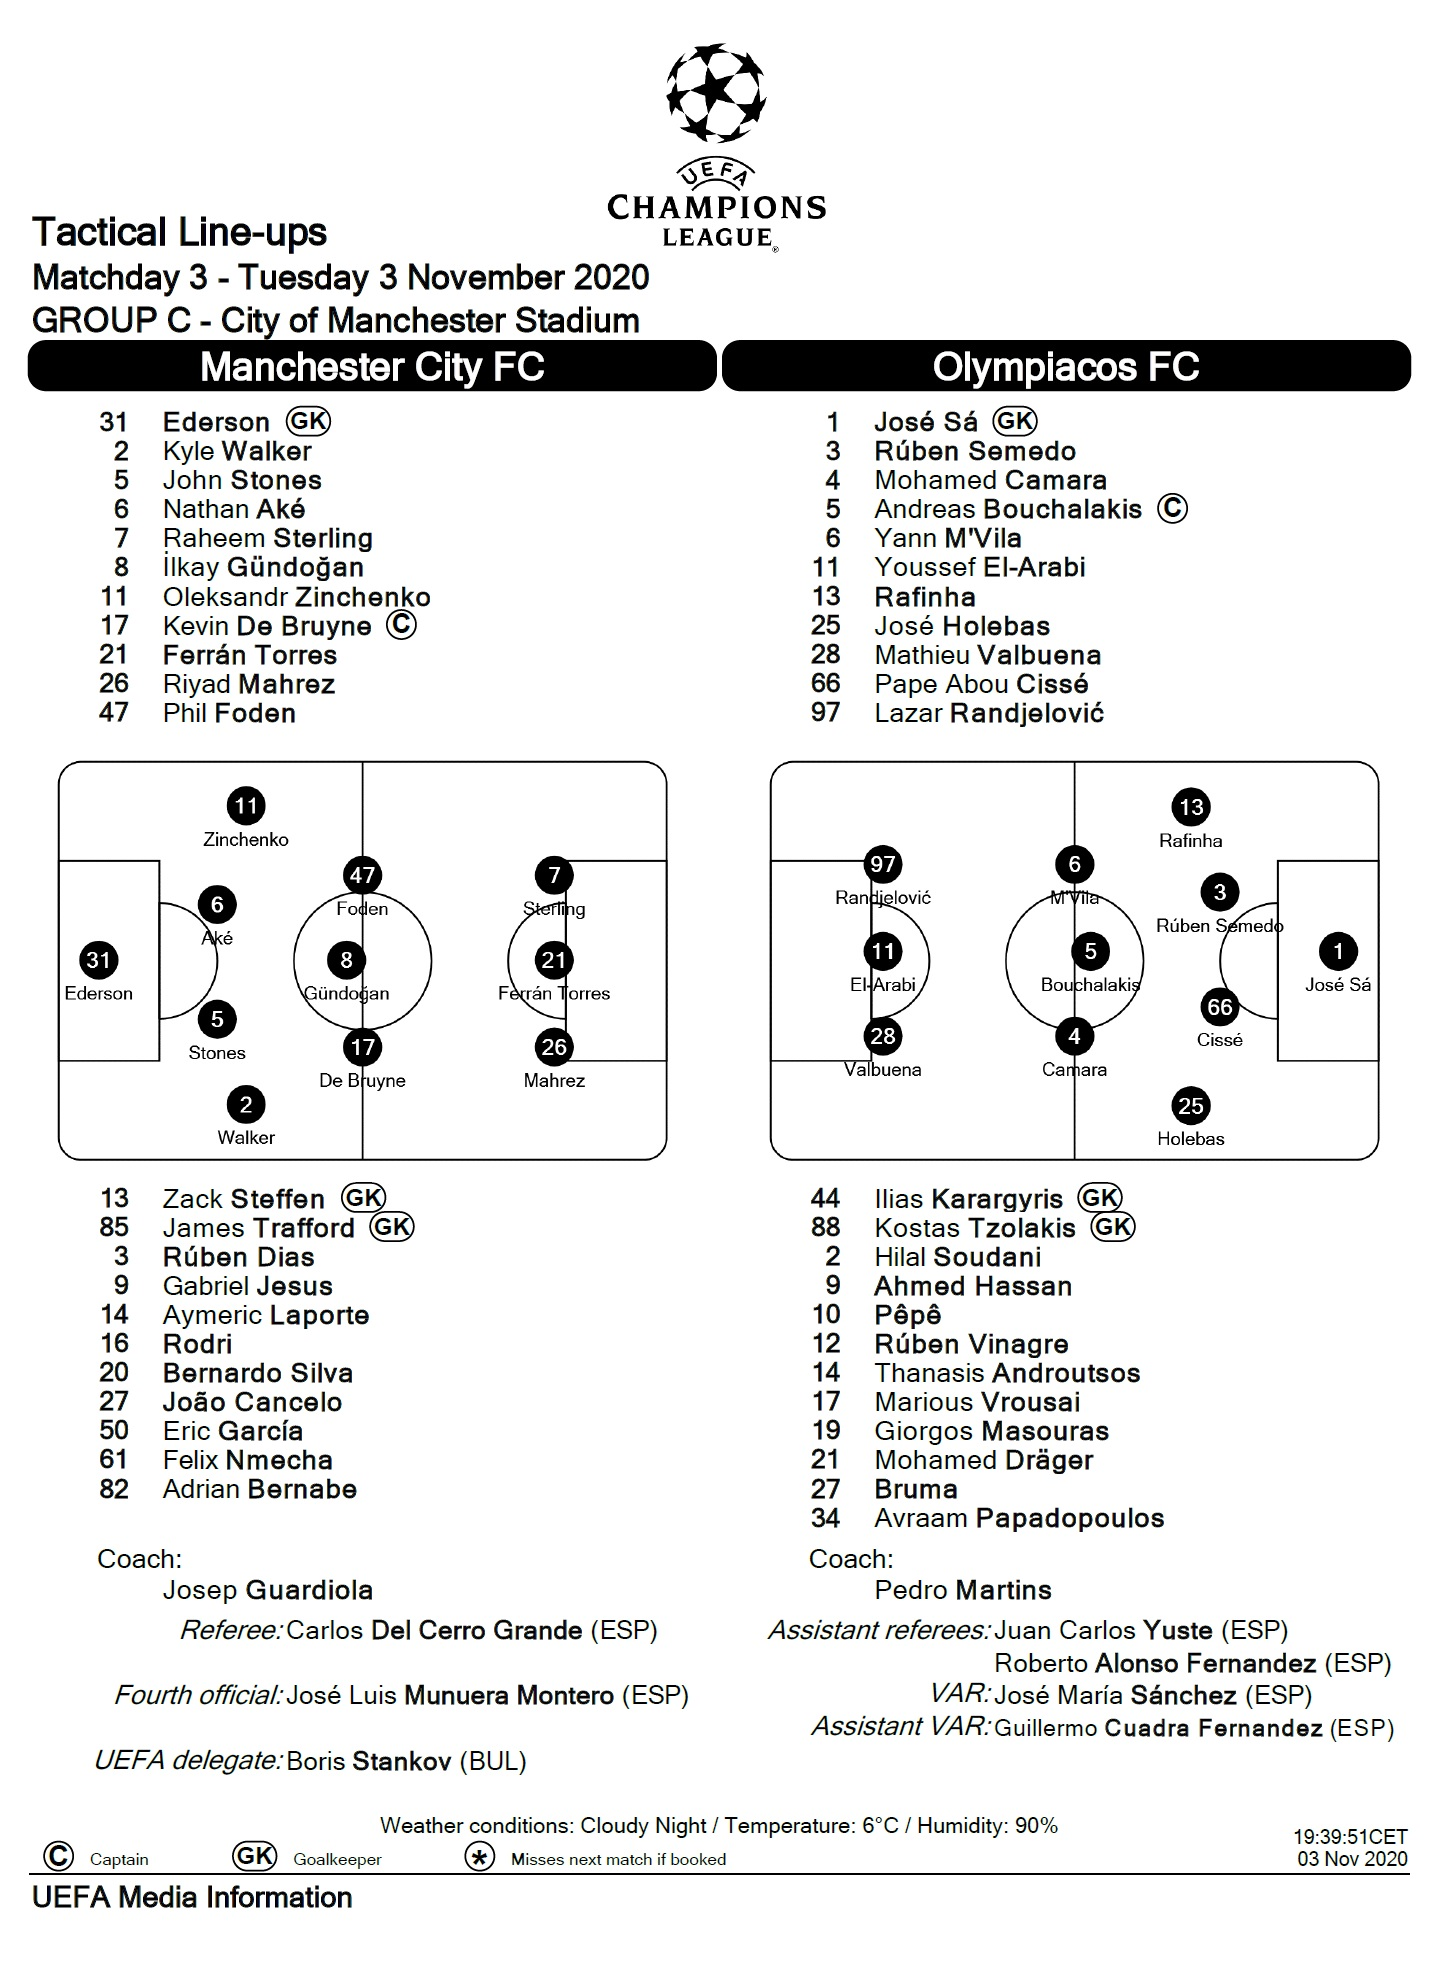 Манчестер Сити (Англия) - Олимпиакос (Греция) 3:0